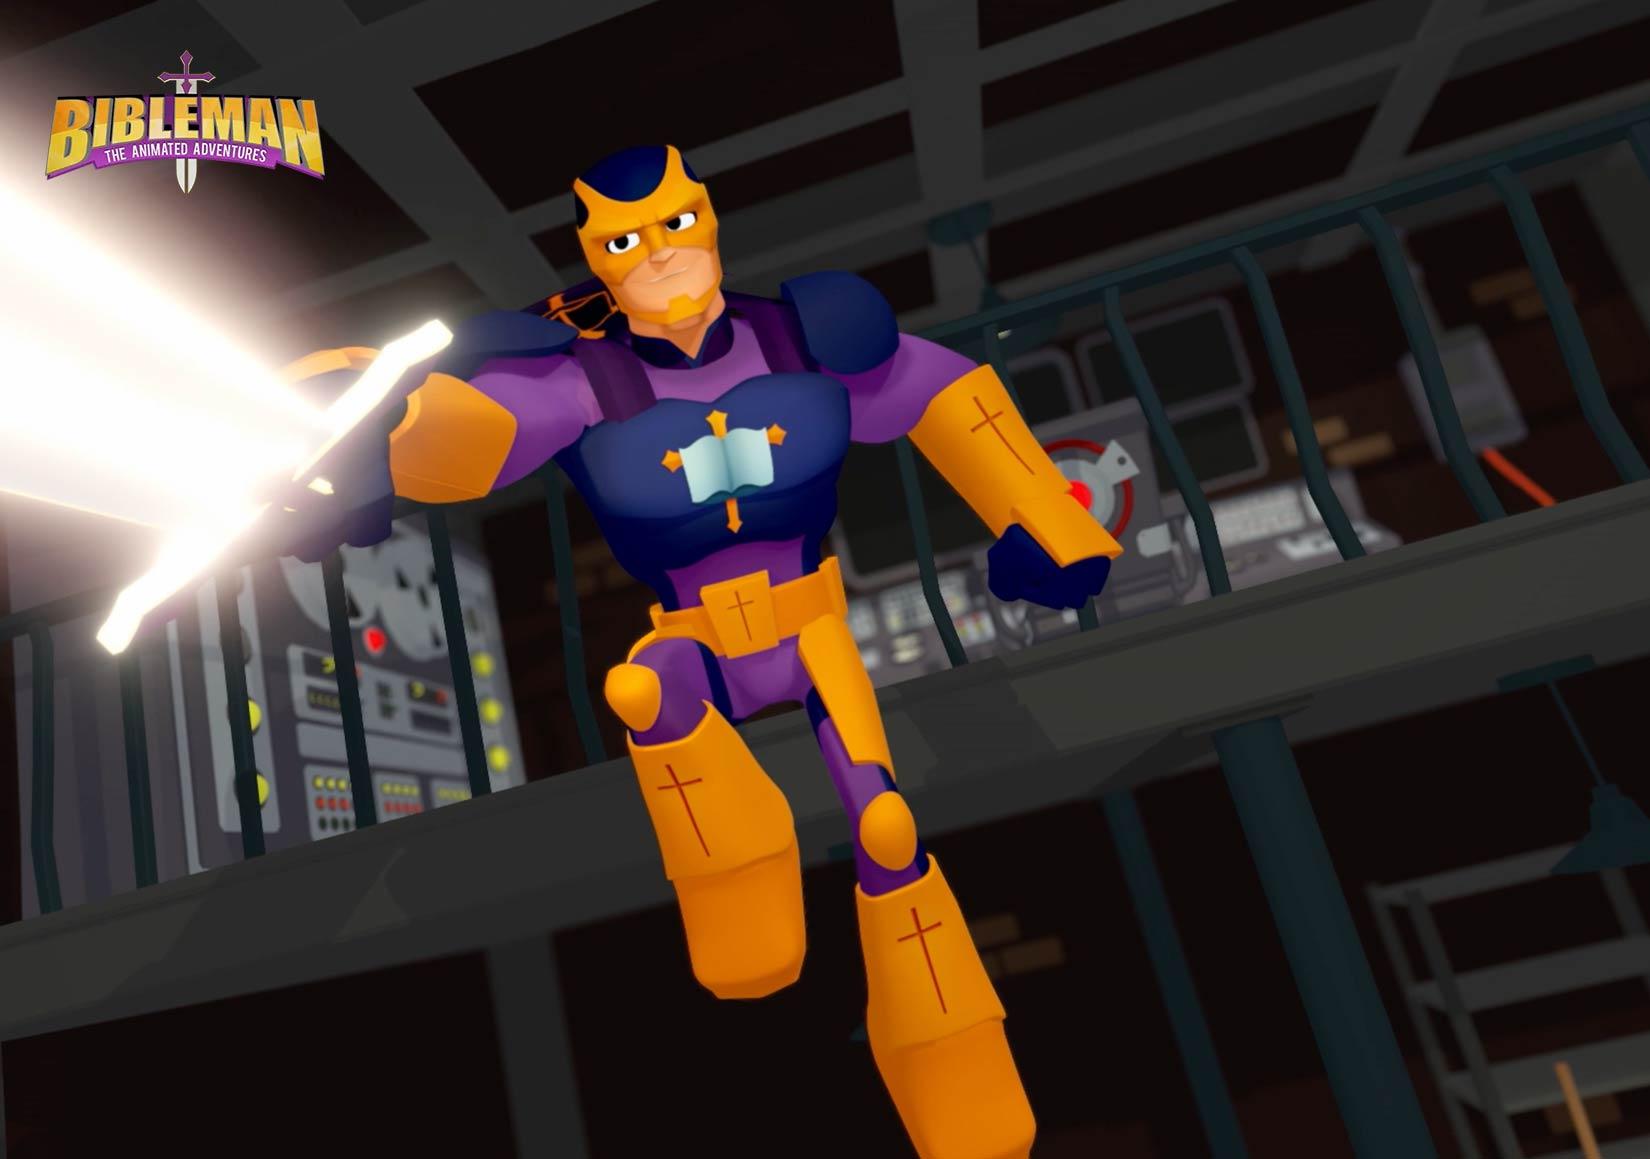 Bibleman - The Animated Adventures